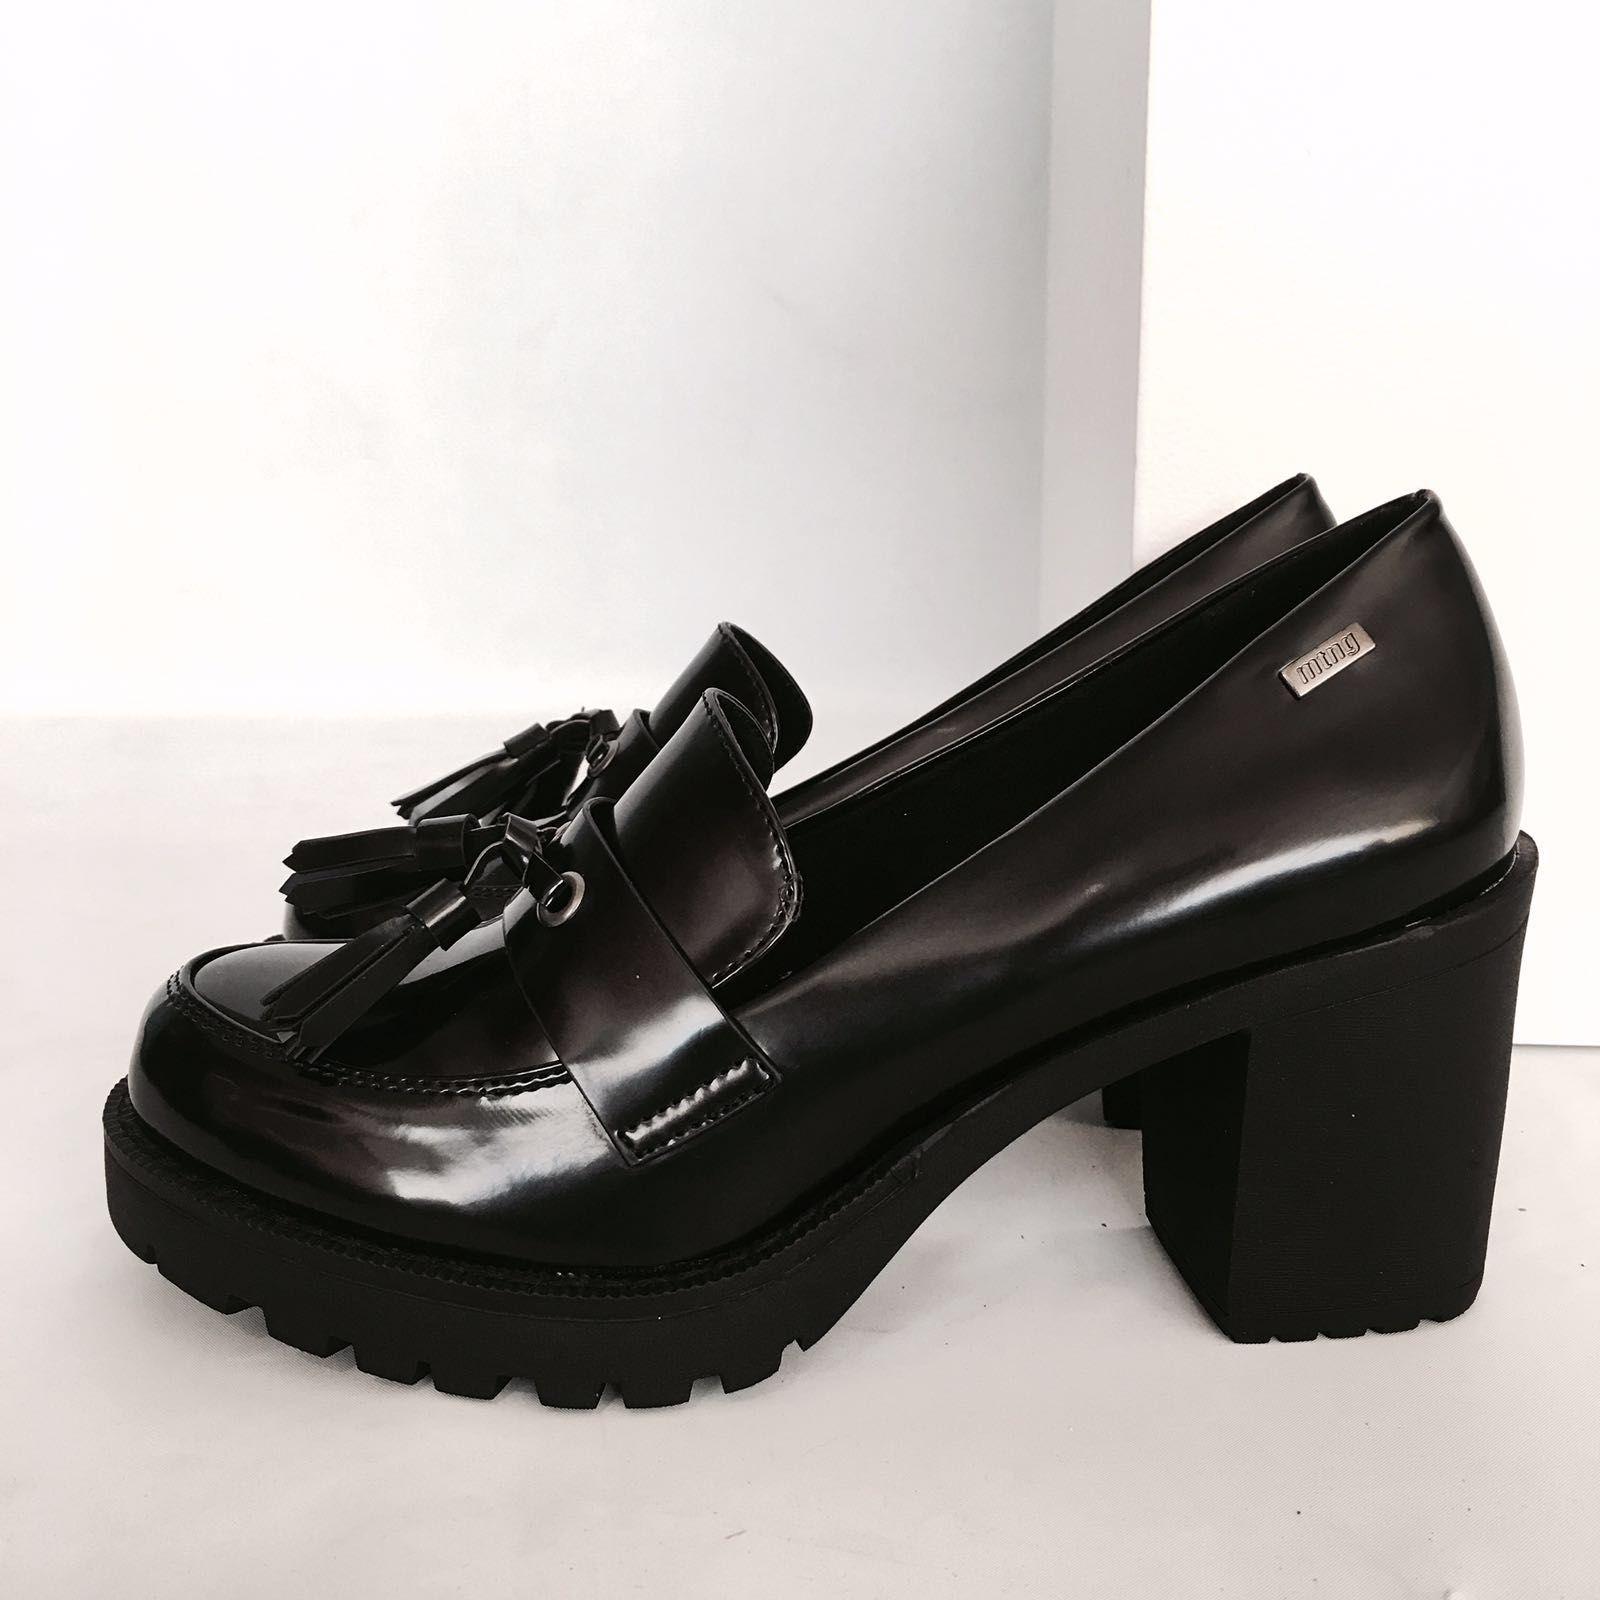 Zapatos negros Mustang para mujer DNDmvpj